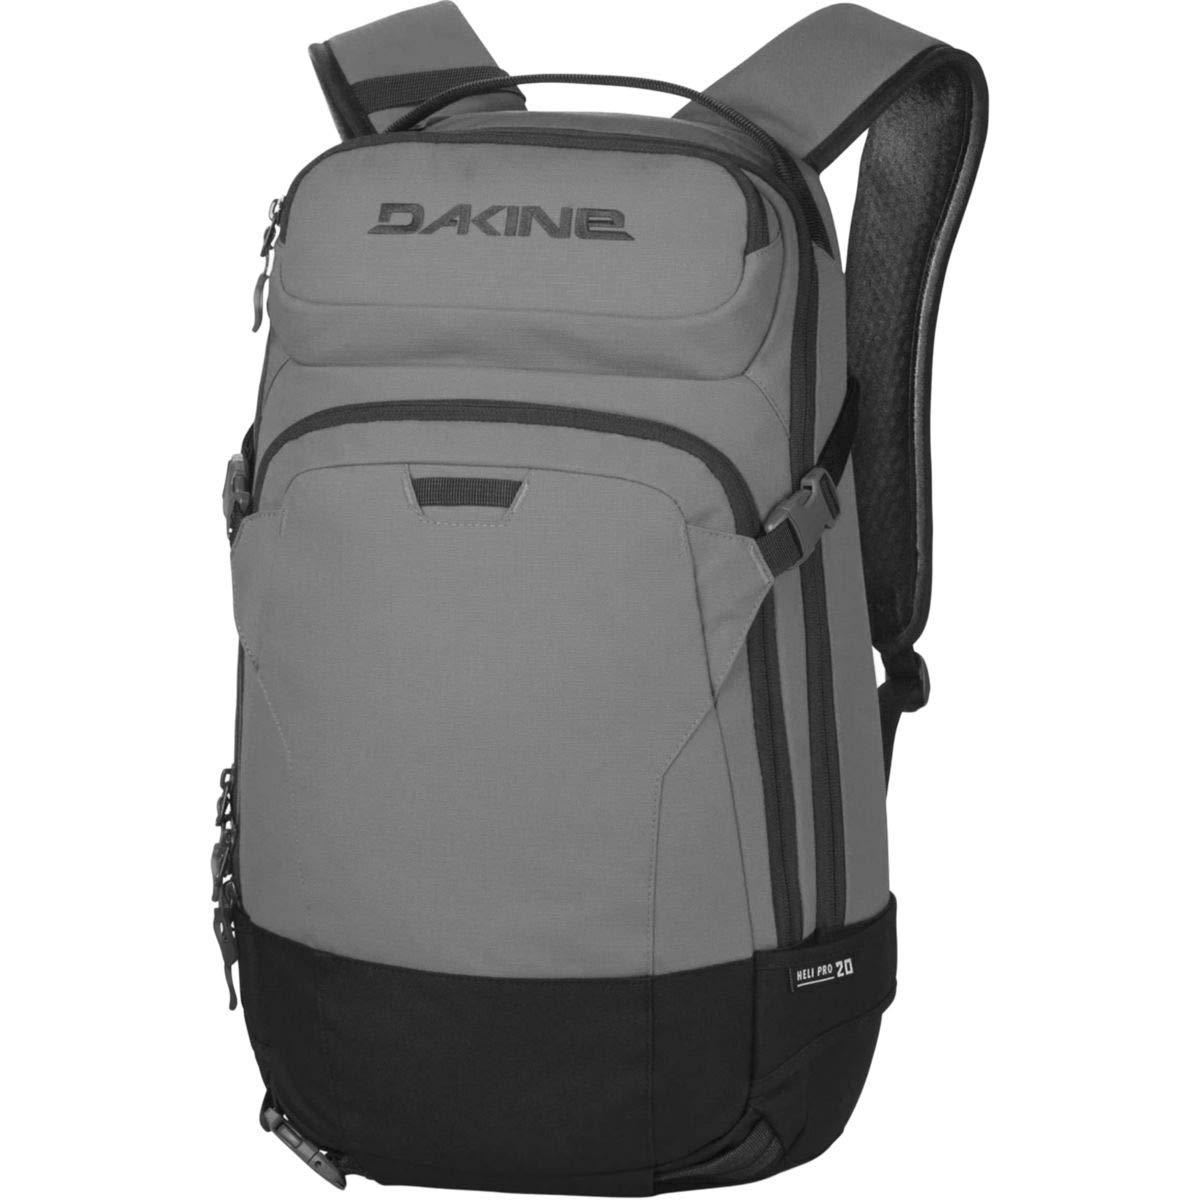 c08c5ba6140c Amazon.com   Dakine Heli Pro Backpack   Sports   Outdoors